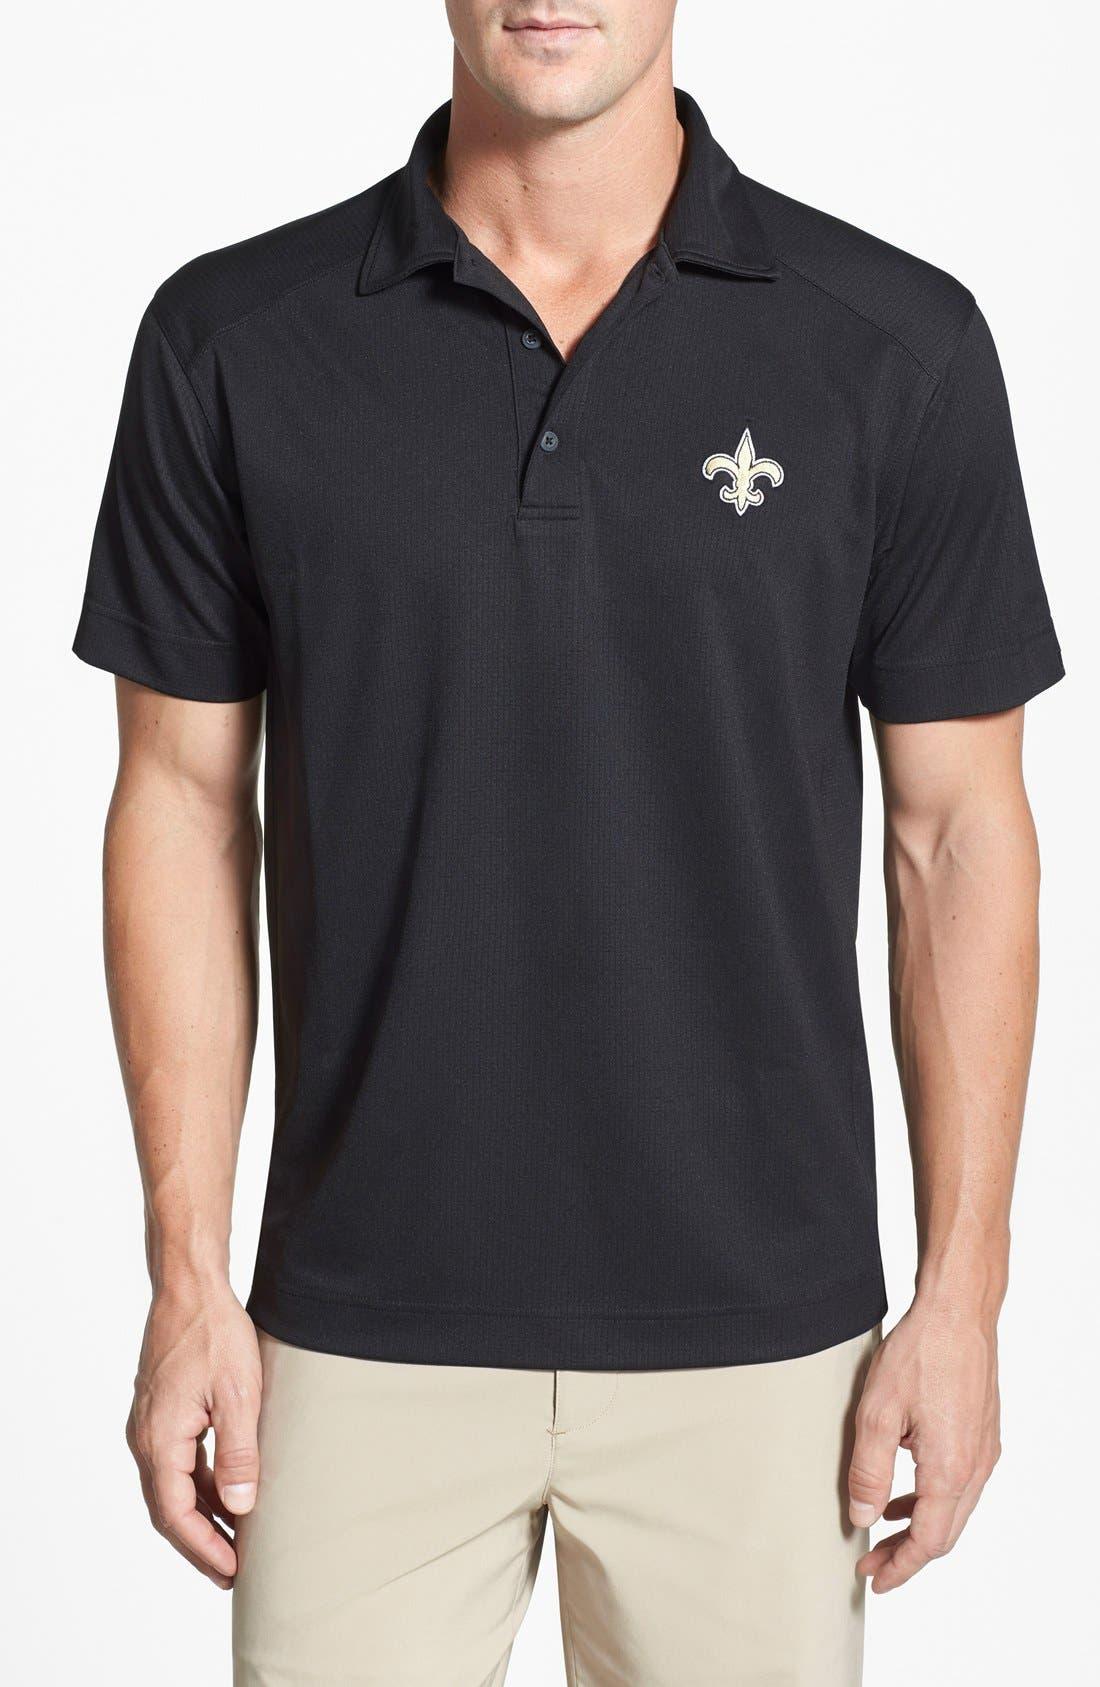 'New Orleans Saints - Genre' DryTec Moisture Wicking Polo,                             Main thumbnail 1, color,                             Black